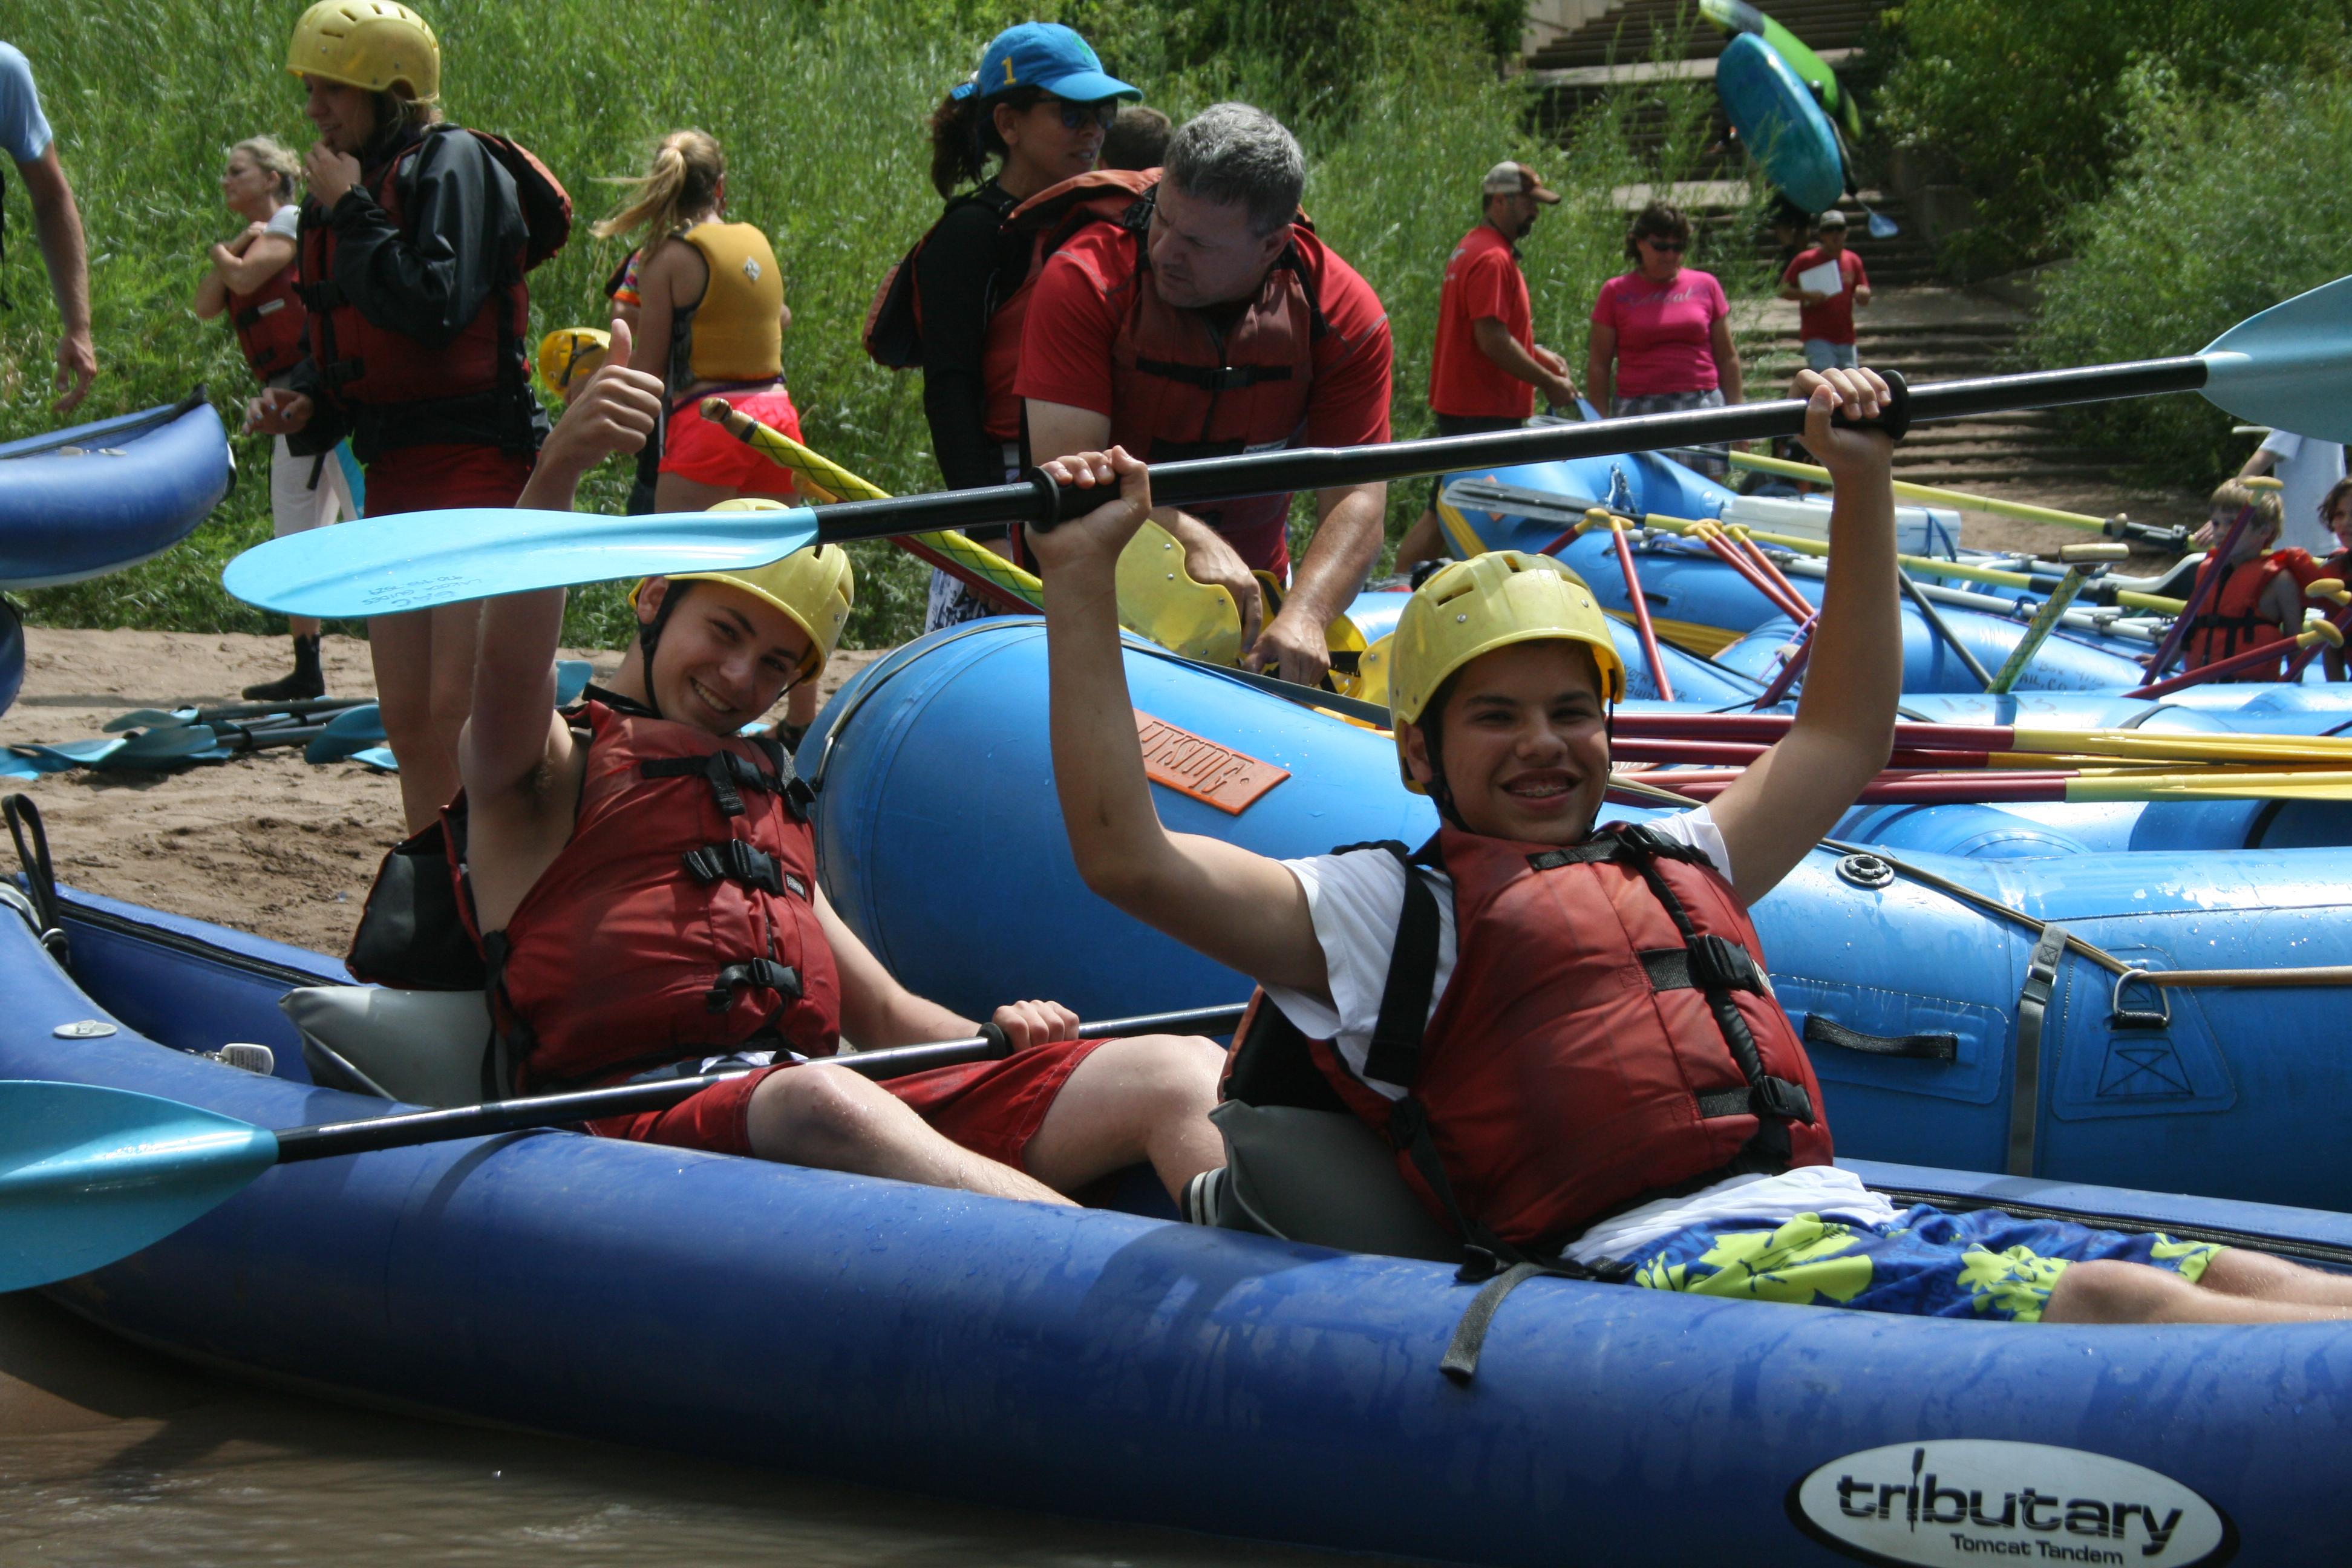 Inflatable Kayak Rentals In Glenwood Springs Colorado River